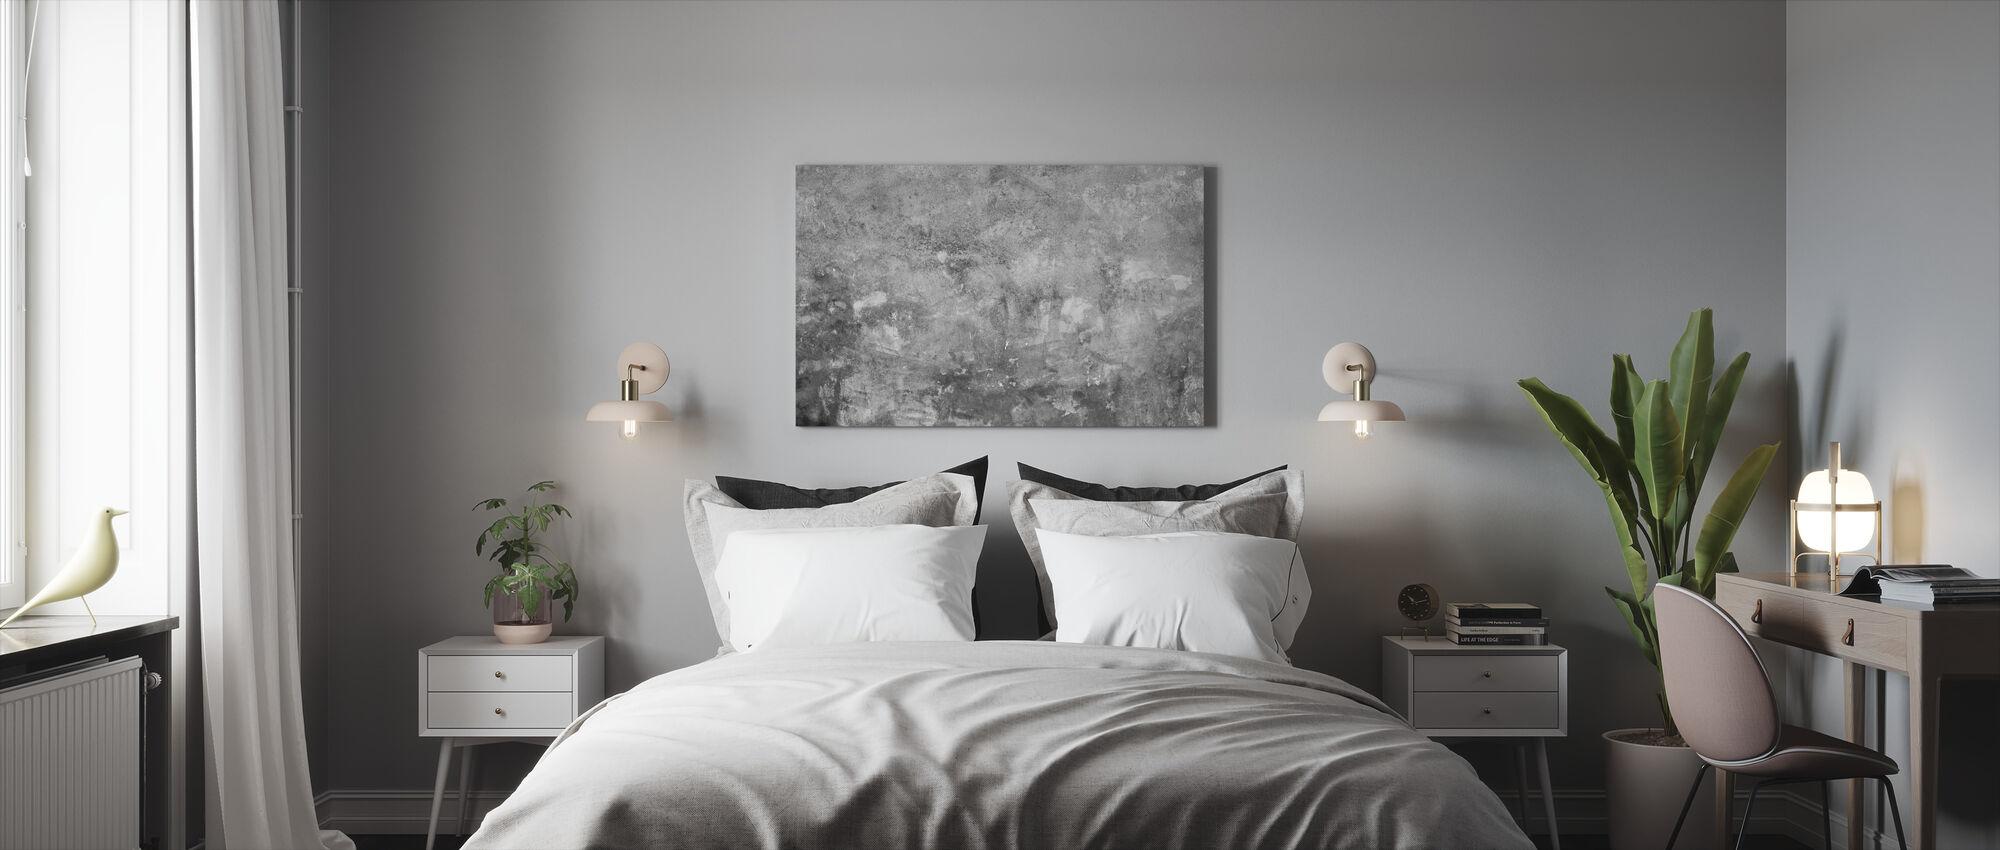 Schmutzige Betonwand - Leinwandbild - Schlafzimmer